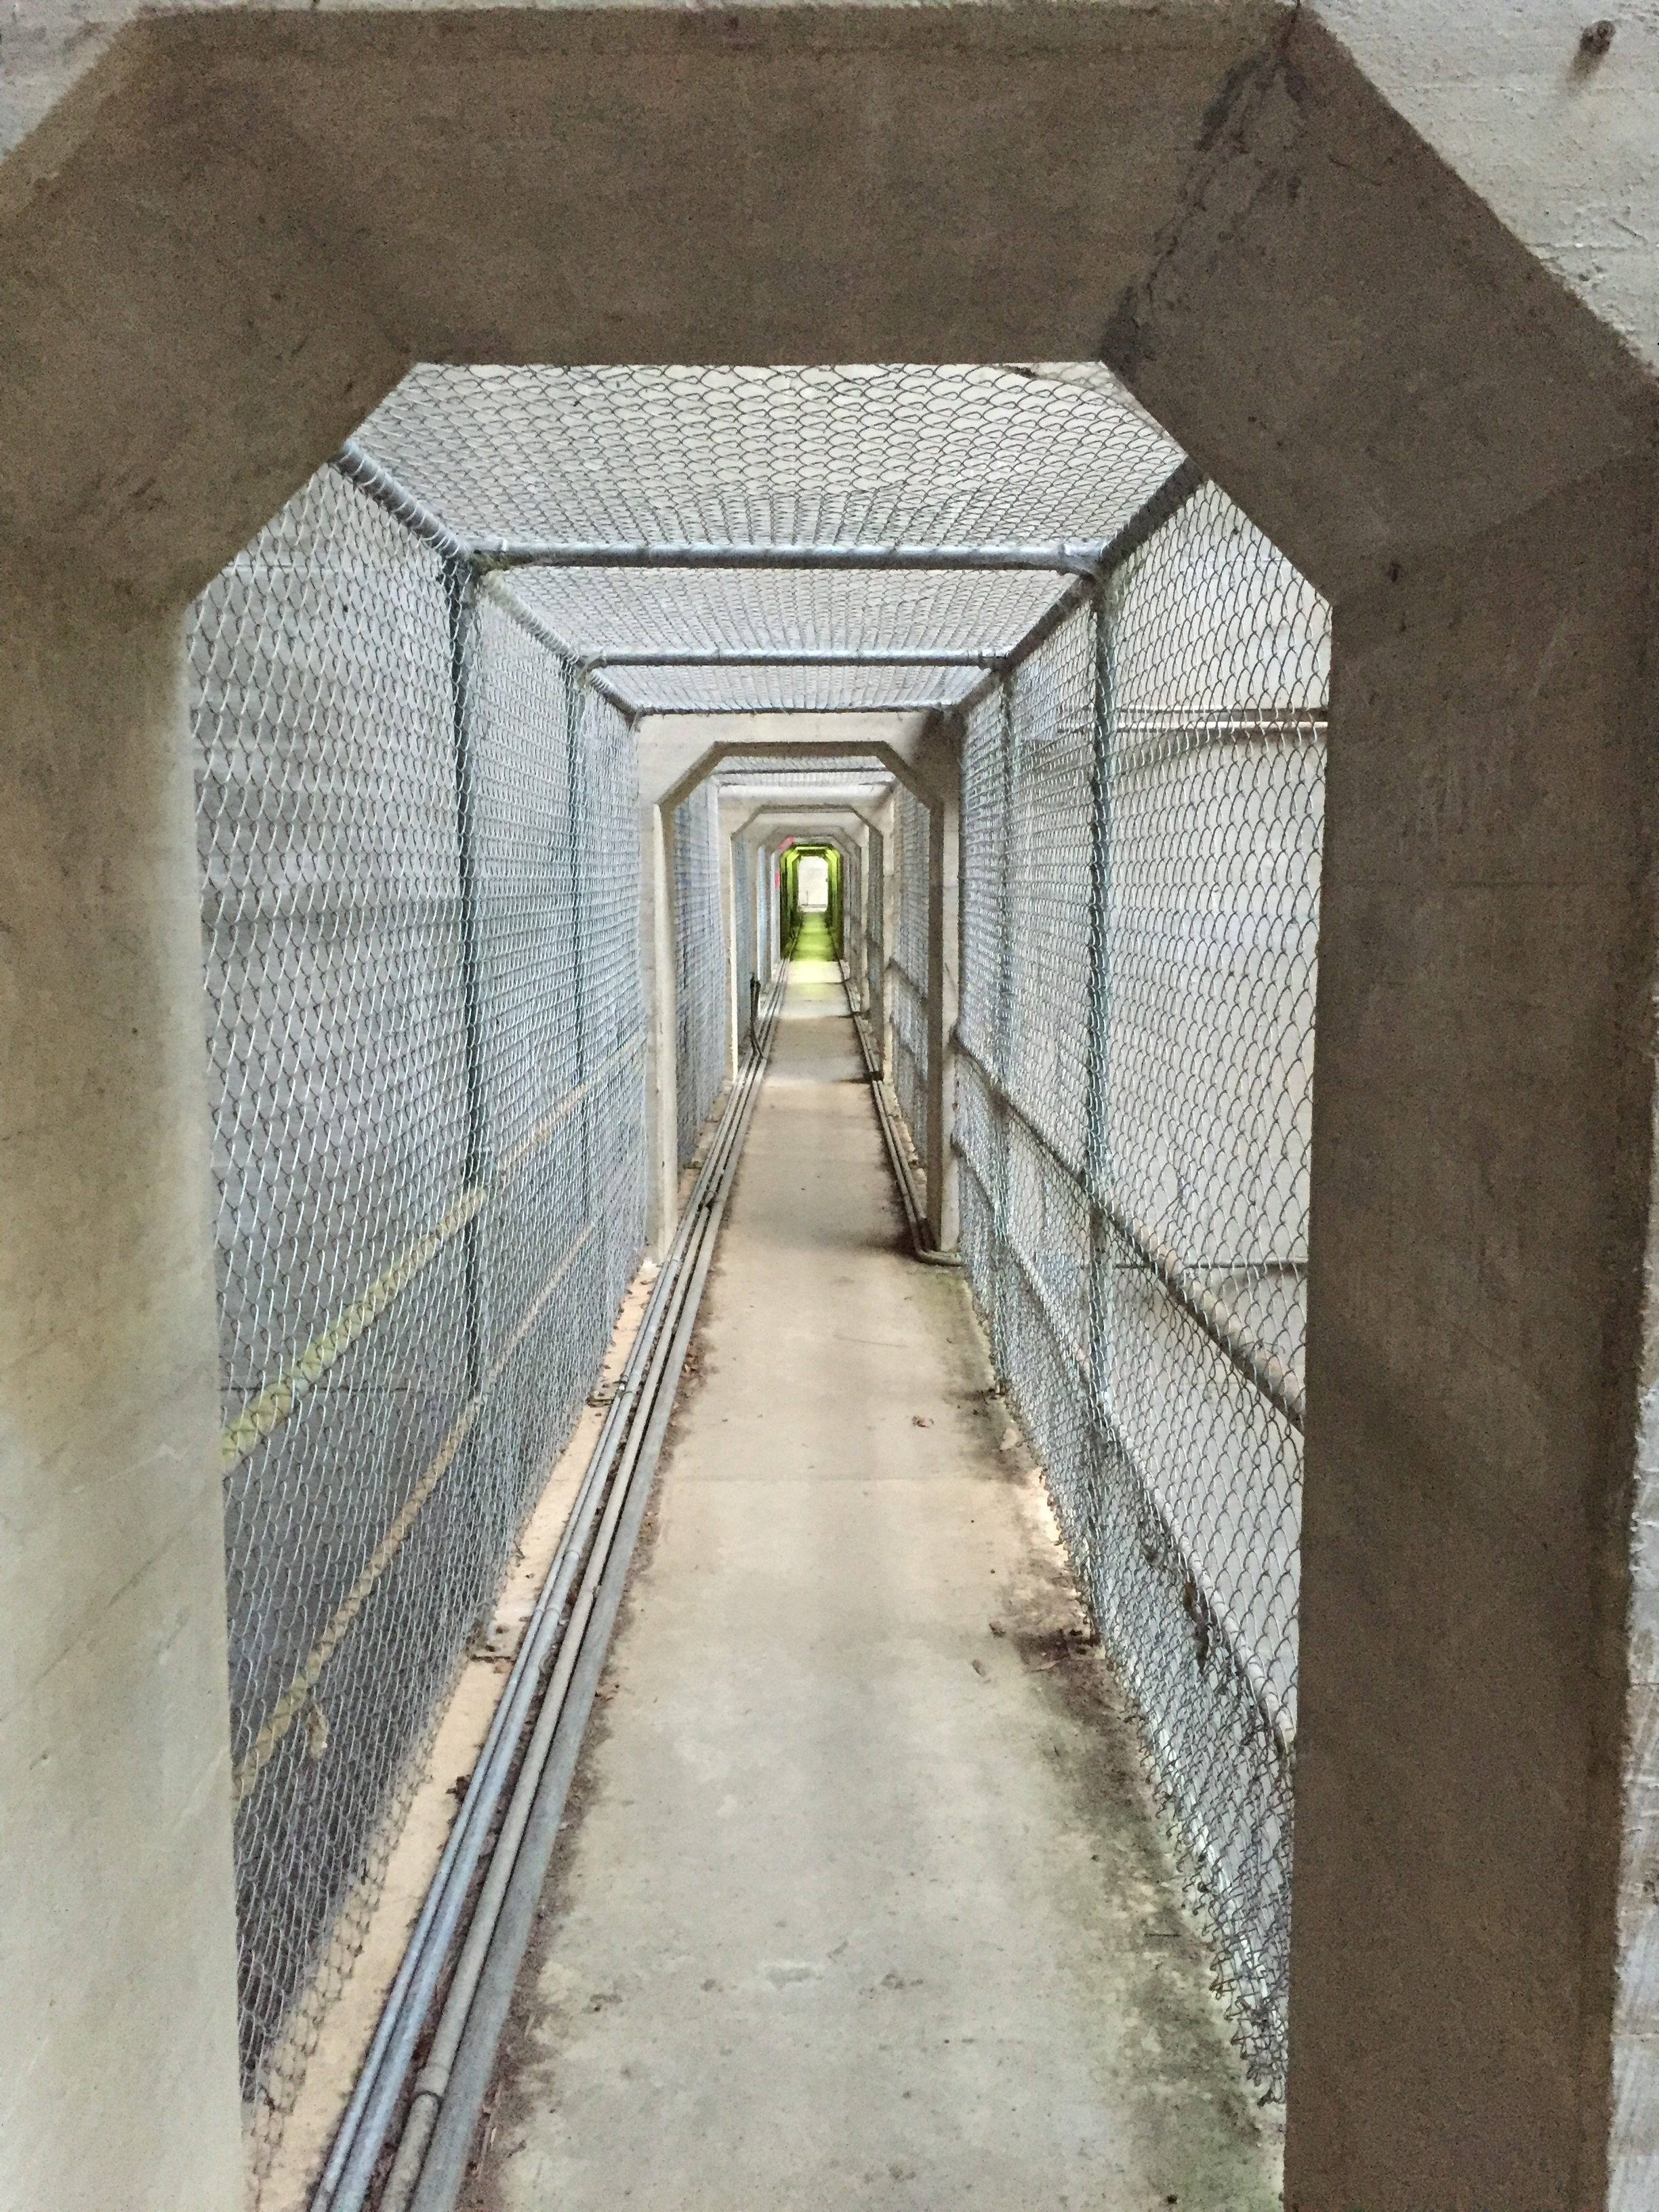 Through the dam wall...